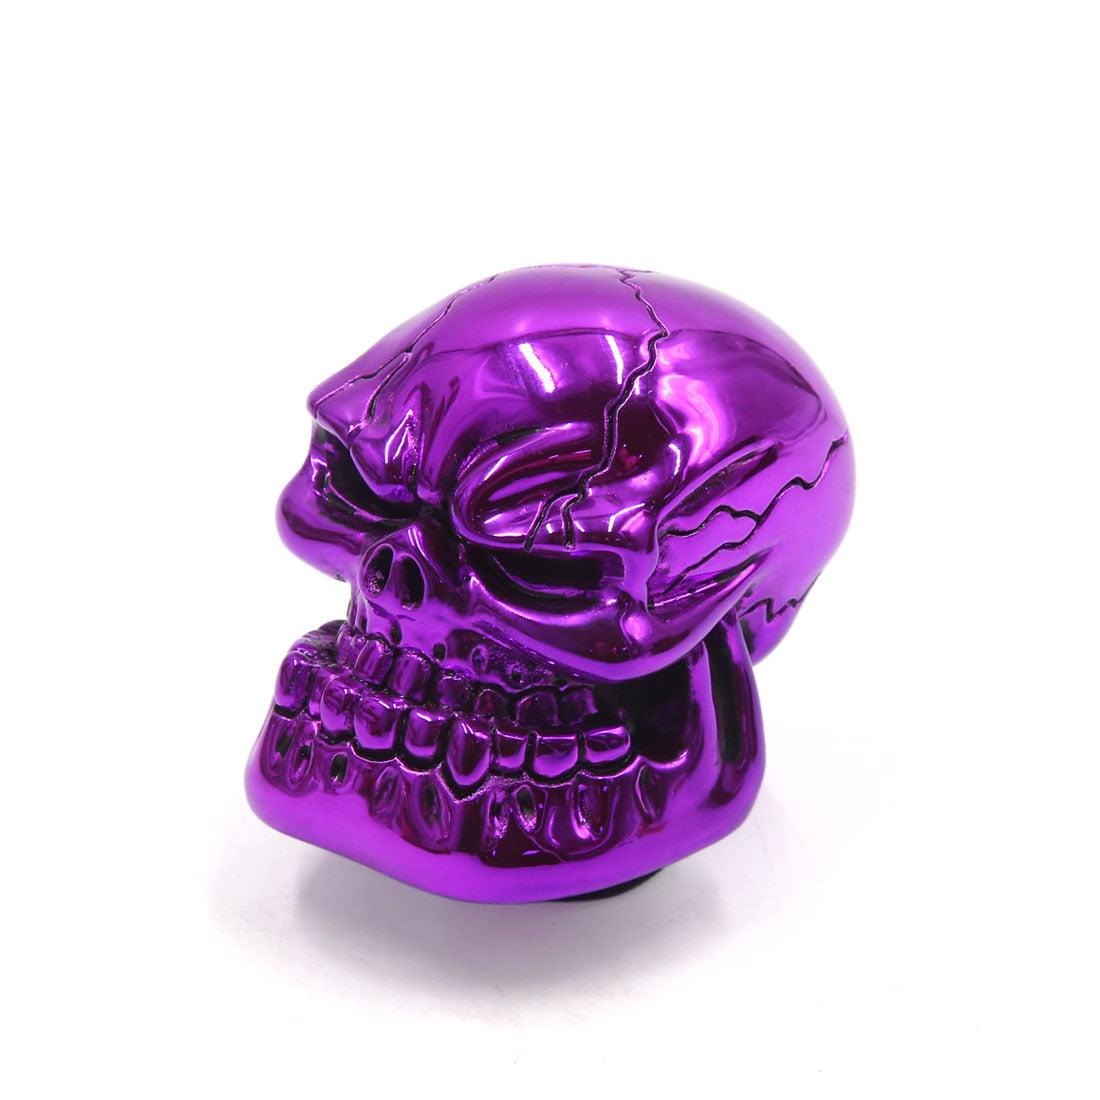 Universal Skull Head Style Car Manual Stick Gear Shift Knob Lever Shifter Purple